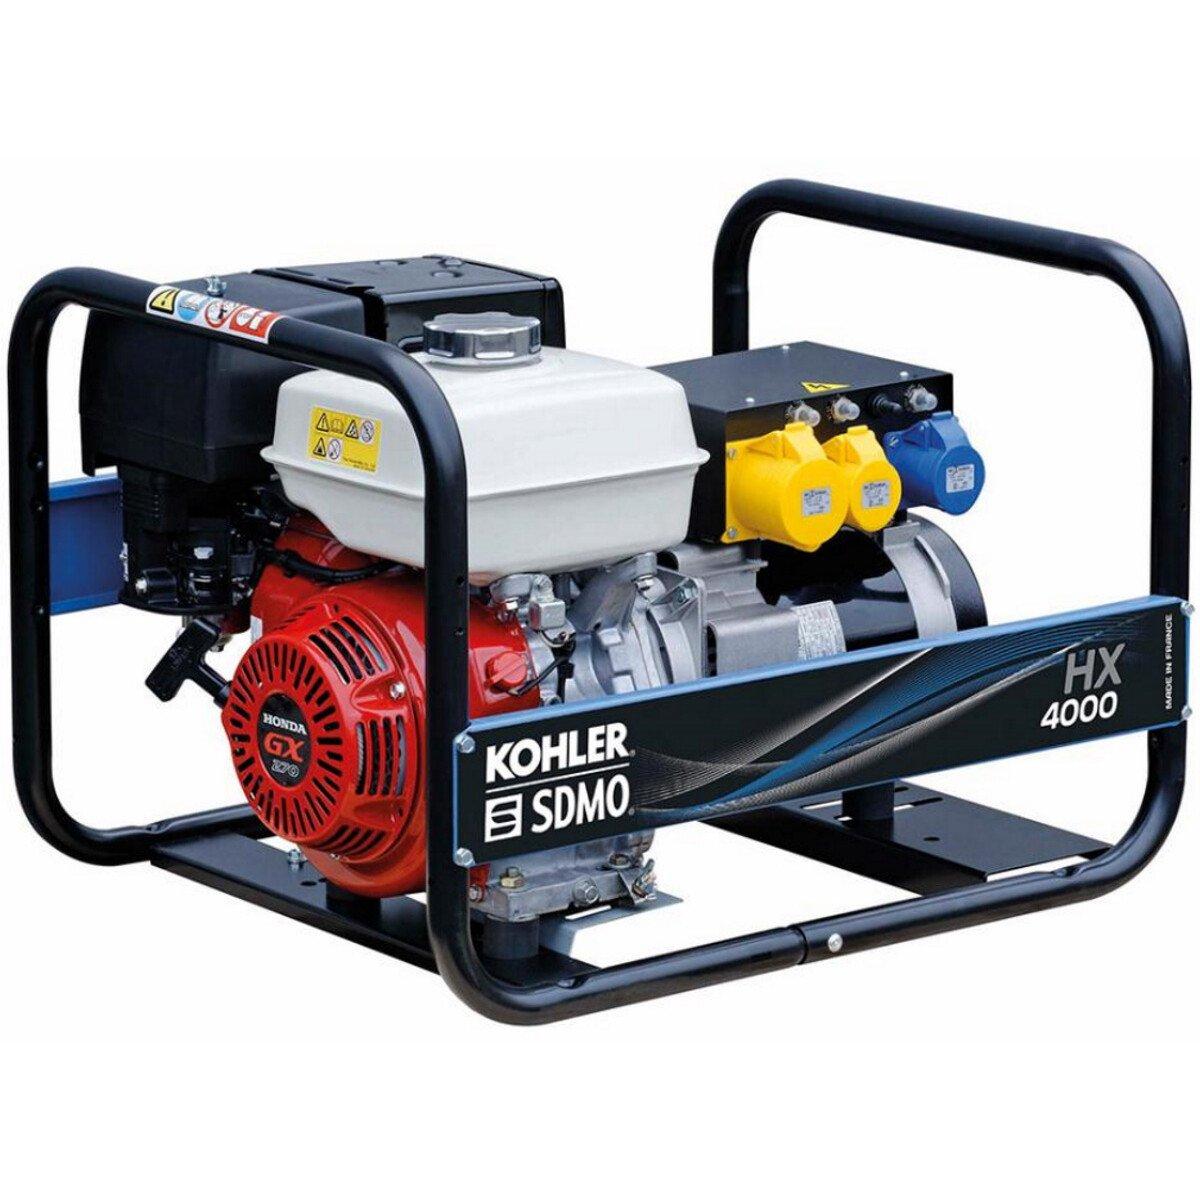 SDMO HX4000 (TB UK) 4.625kVA / 3.7kW Honda GX270 4 Stroke Petrol Industrial Generator